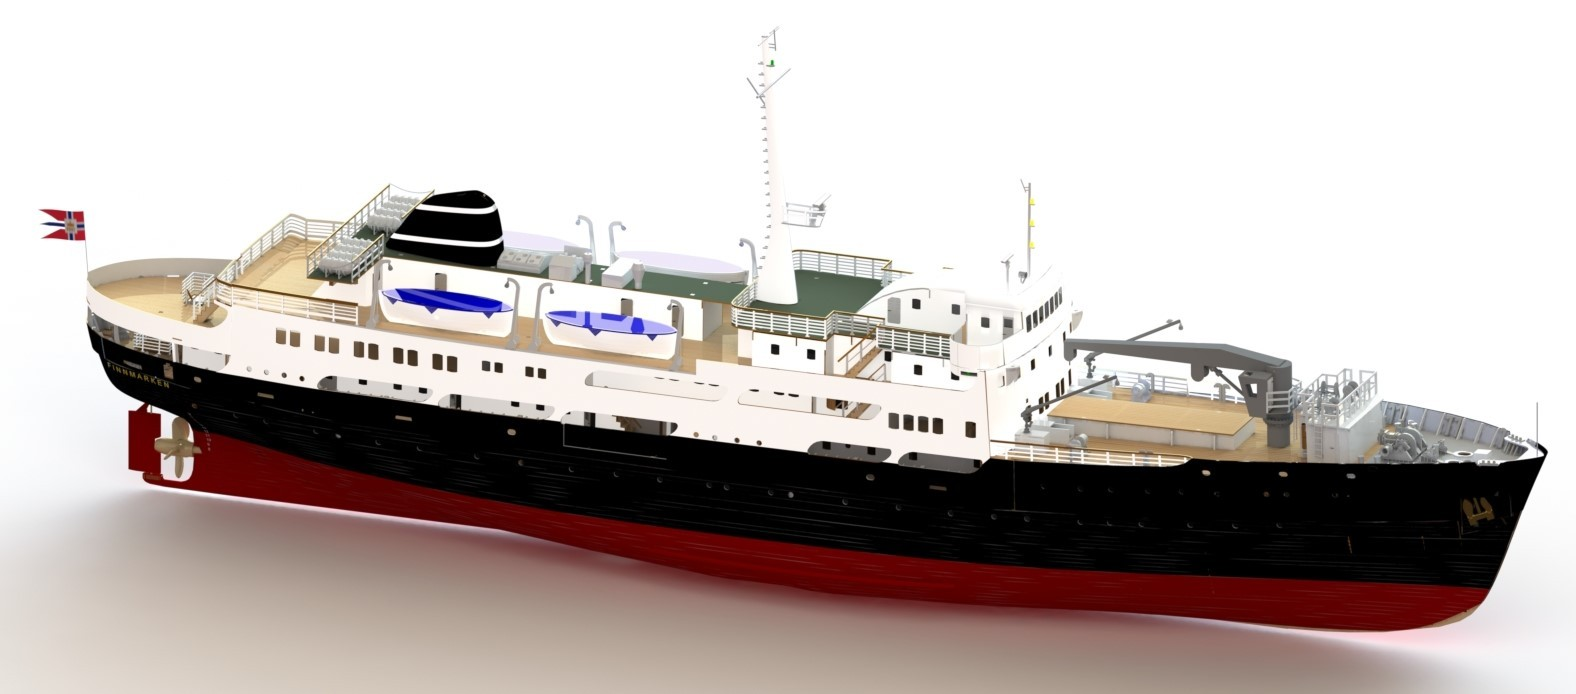 M/S Finnmarken, Norwegian Passenger Ship (Turk, 1:60)